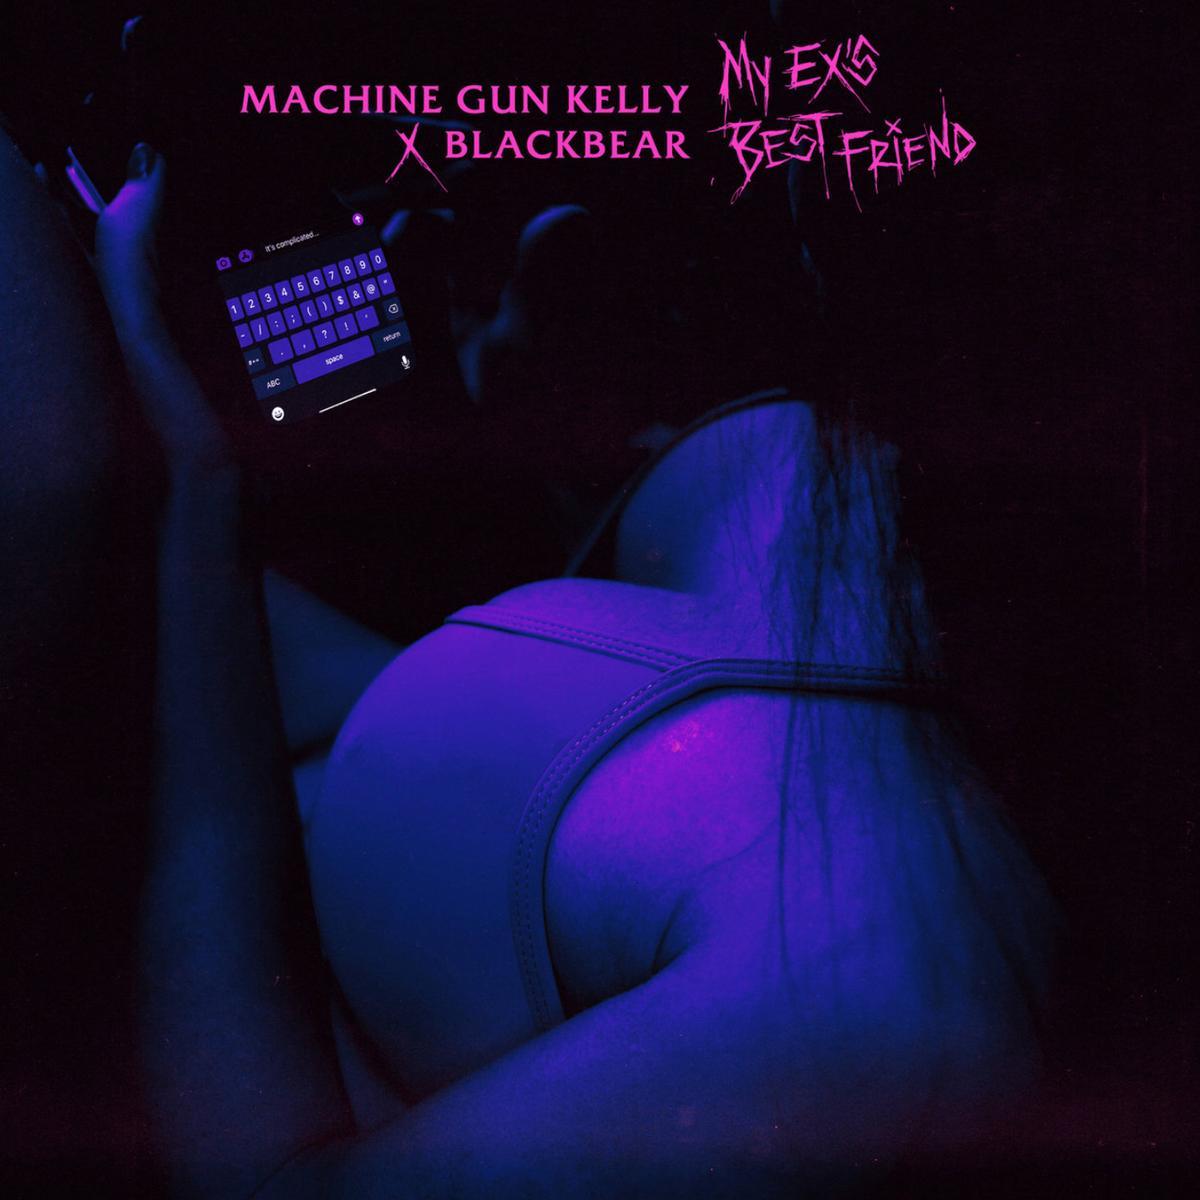 Art for My Ex's Best Friend (Clean) by Machine Gun Kelly ft blackbear